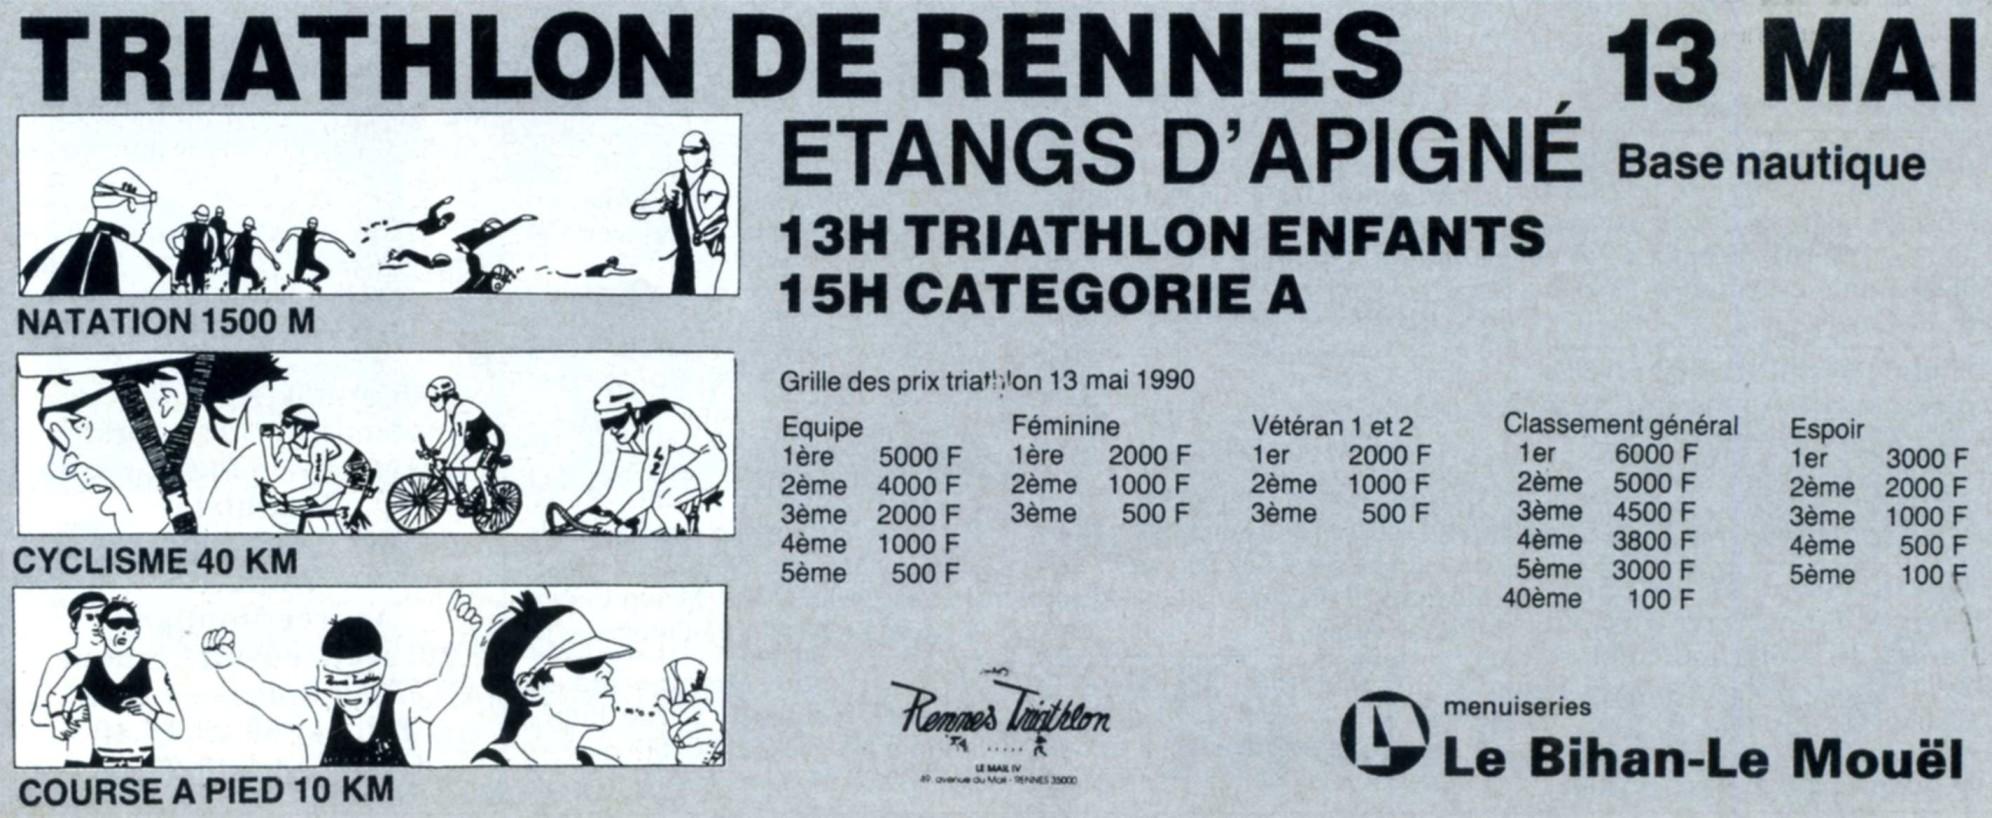 img[A]011_13-MAI-1990_RENNES_pub_70